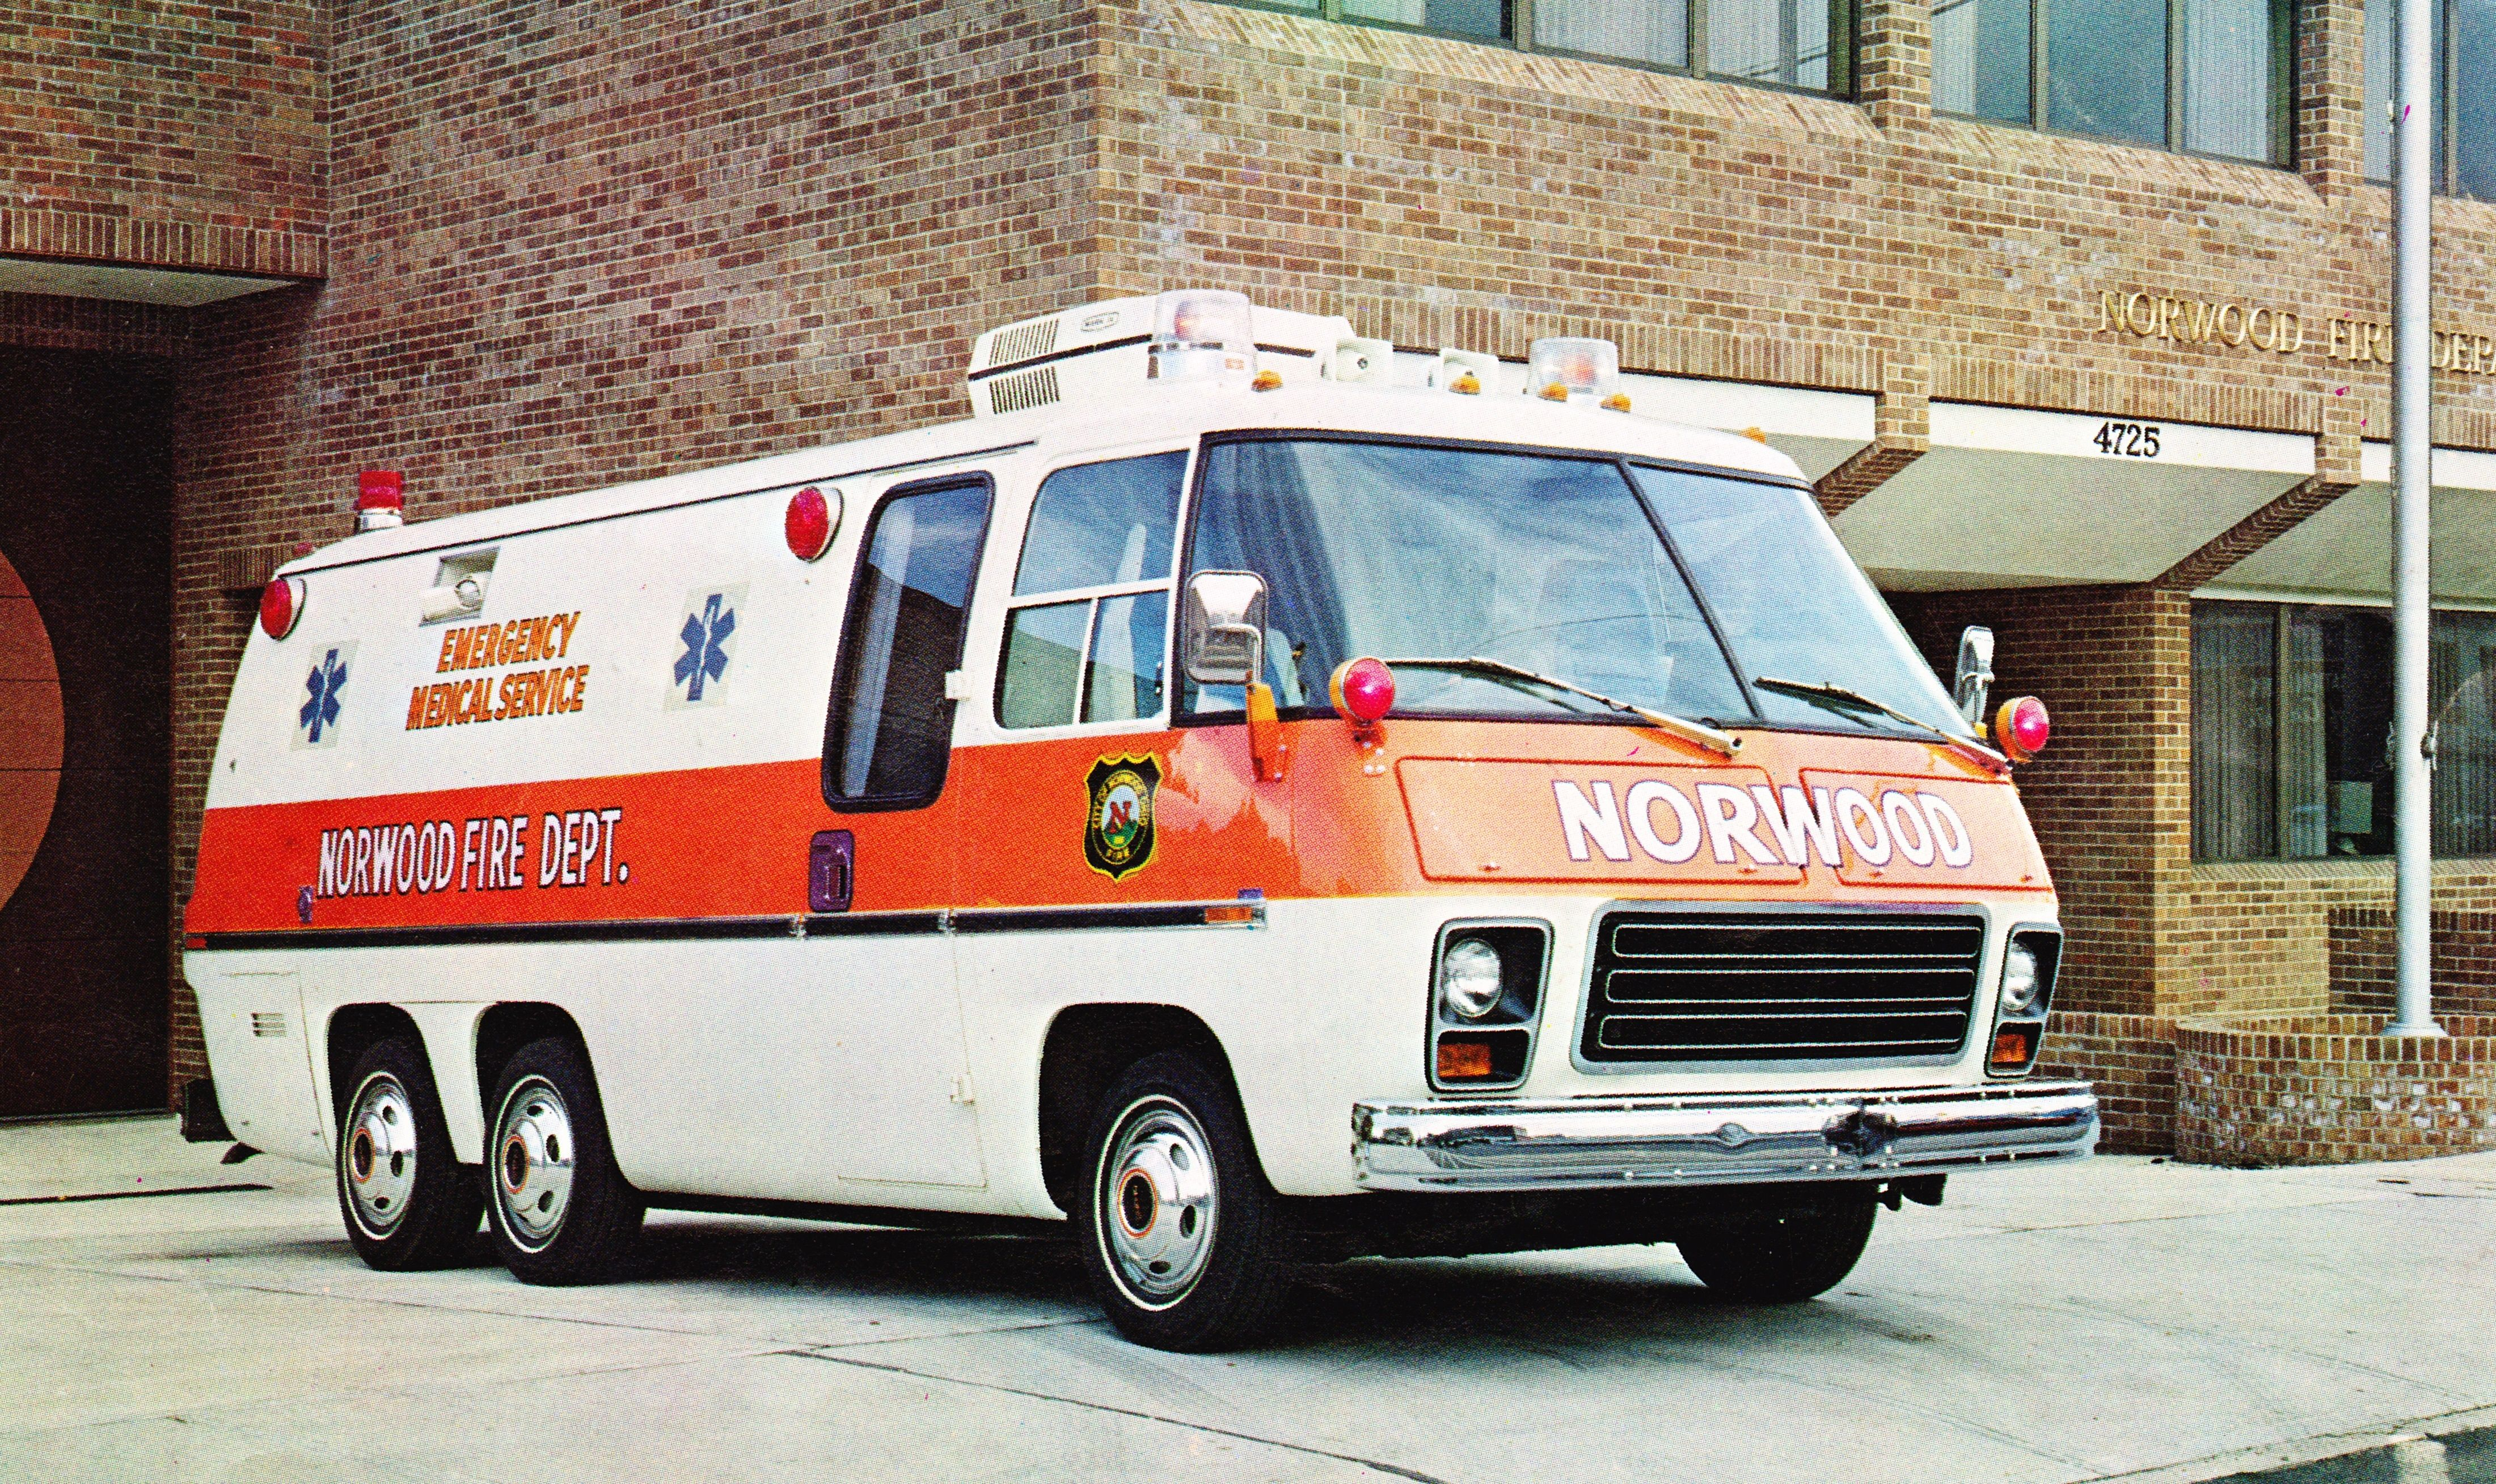 Emergency Vehicle Equipment Wikipedia The Free Encyclopedia Emergency Vehicles Rescue Vehicles Vehicles